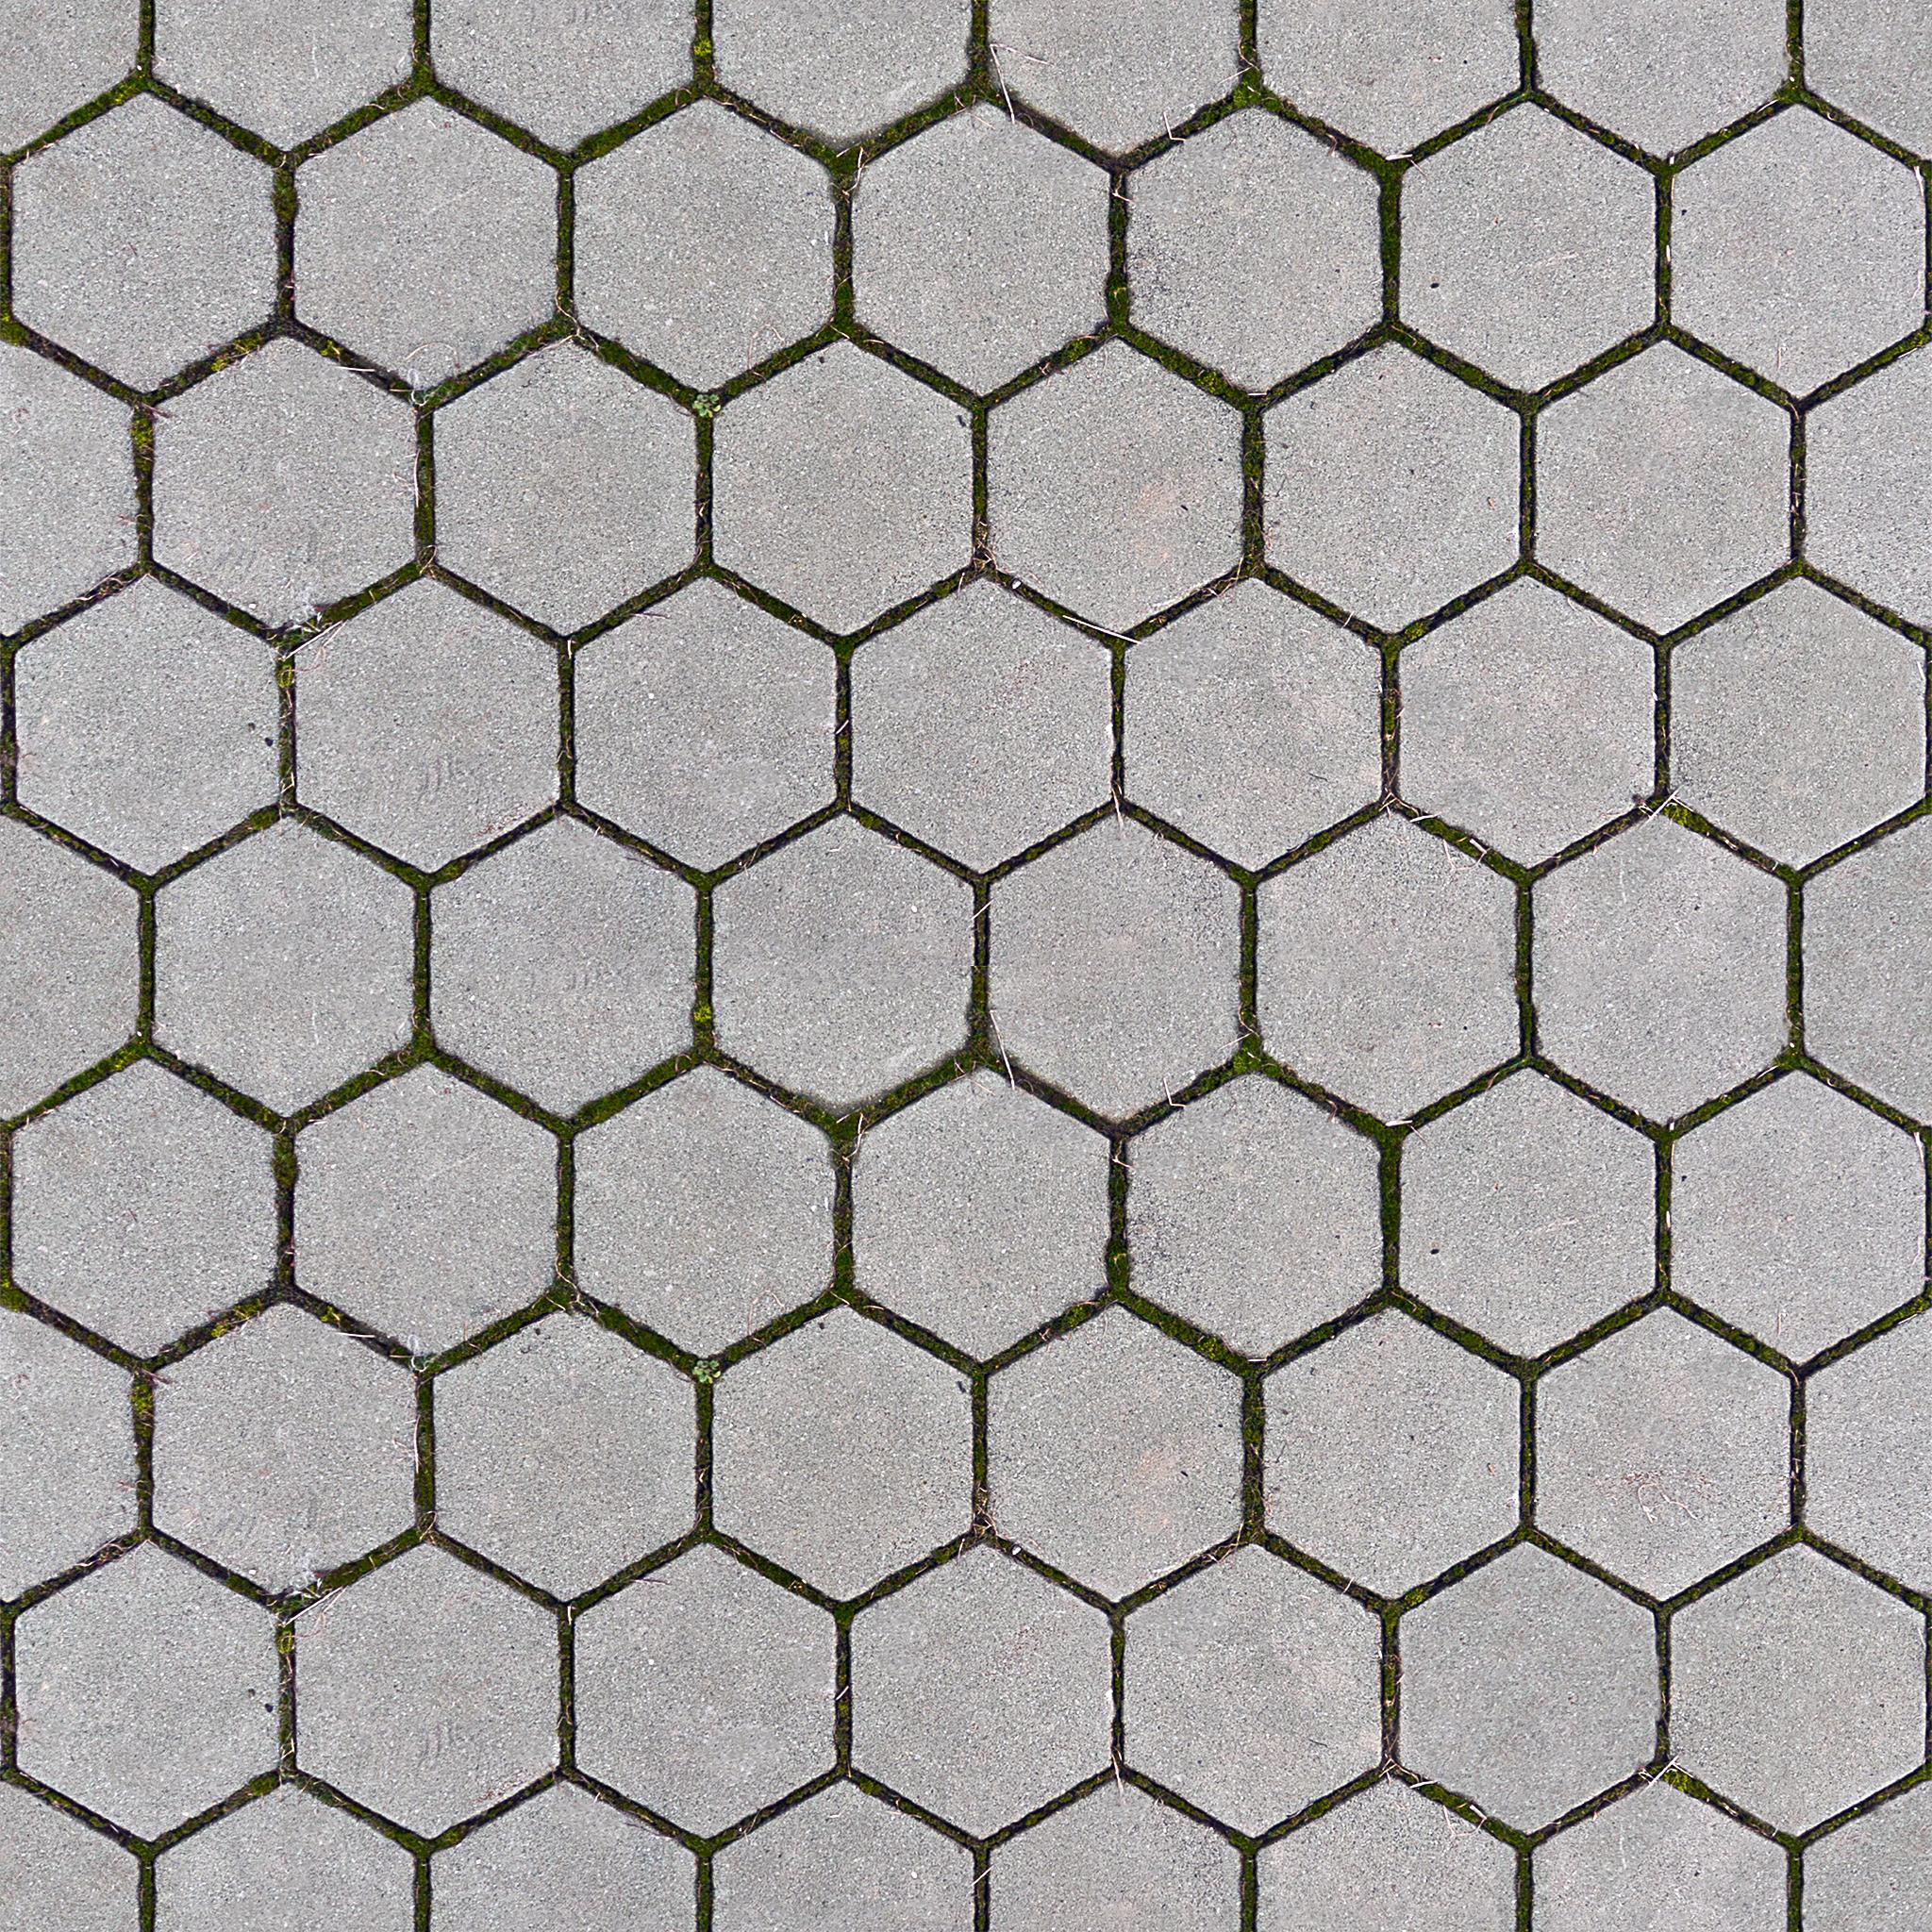 Cool Bathroom Colors Ground Pavement Texture Pack Ground Pavement Brick 01